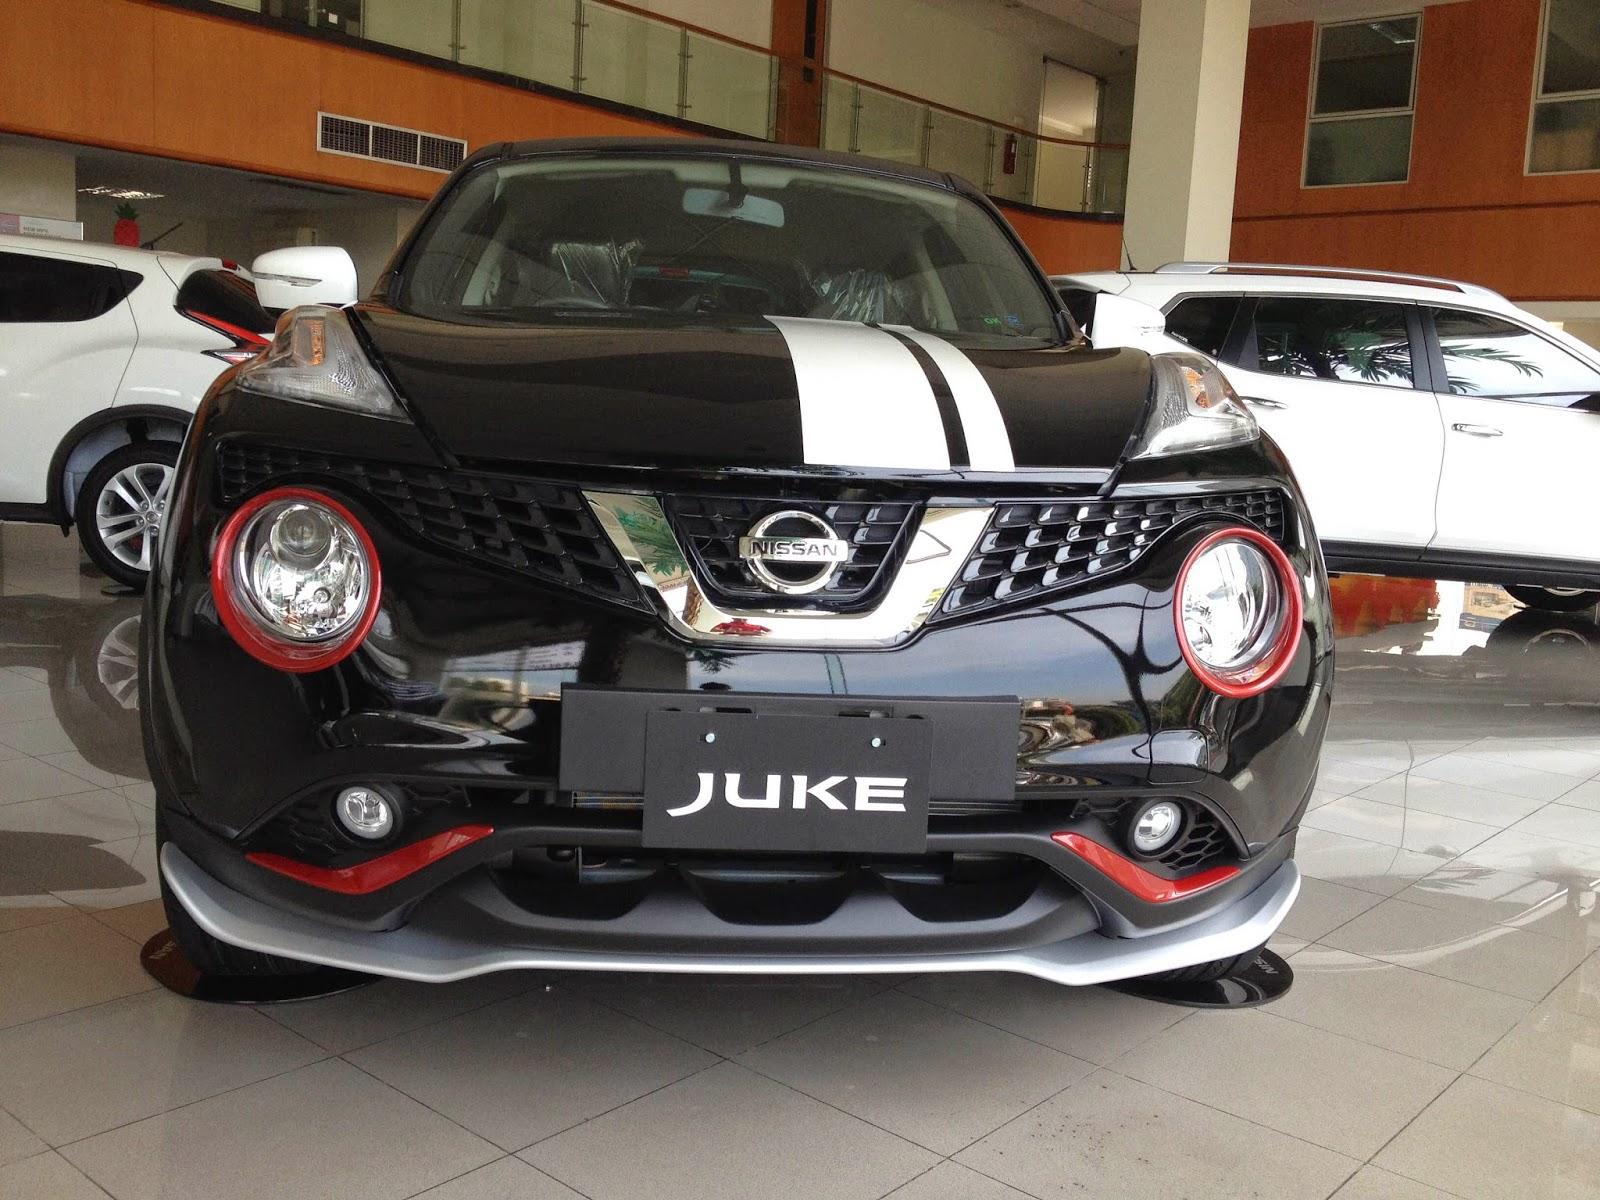 Harga All New Kijang Innova Q Toyota 2.4 A/t Diesel Ford Ecosport Dealer Jakarta | Upcomingcarshq.com